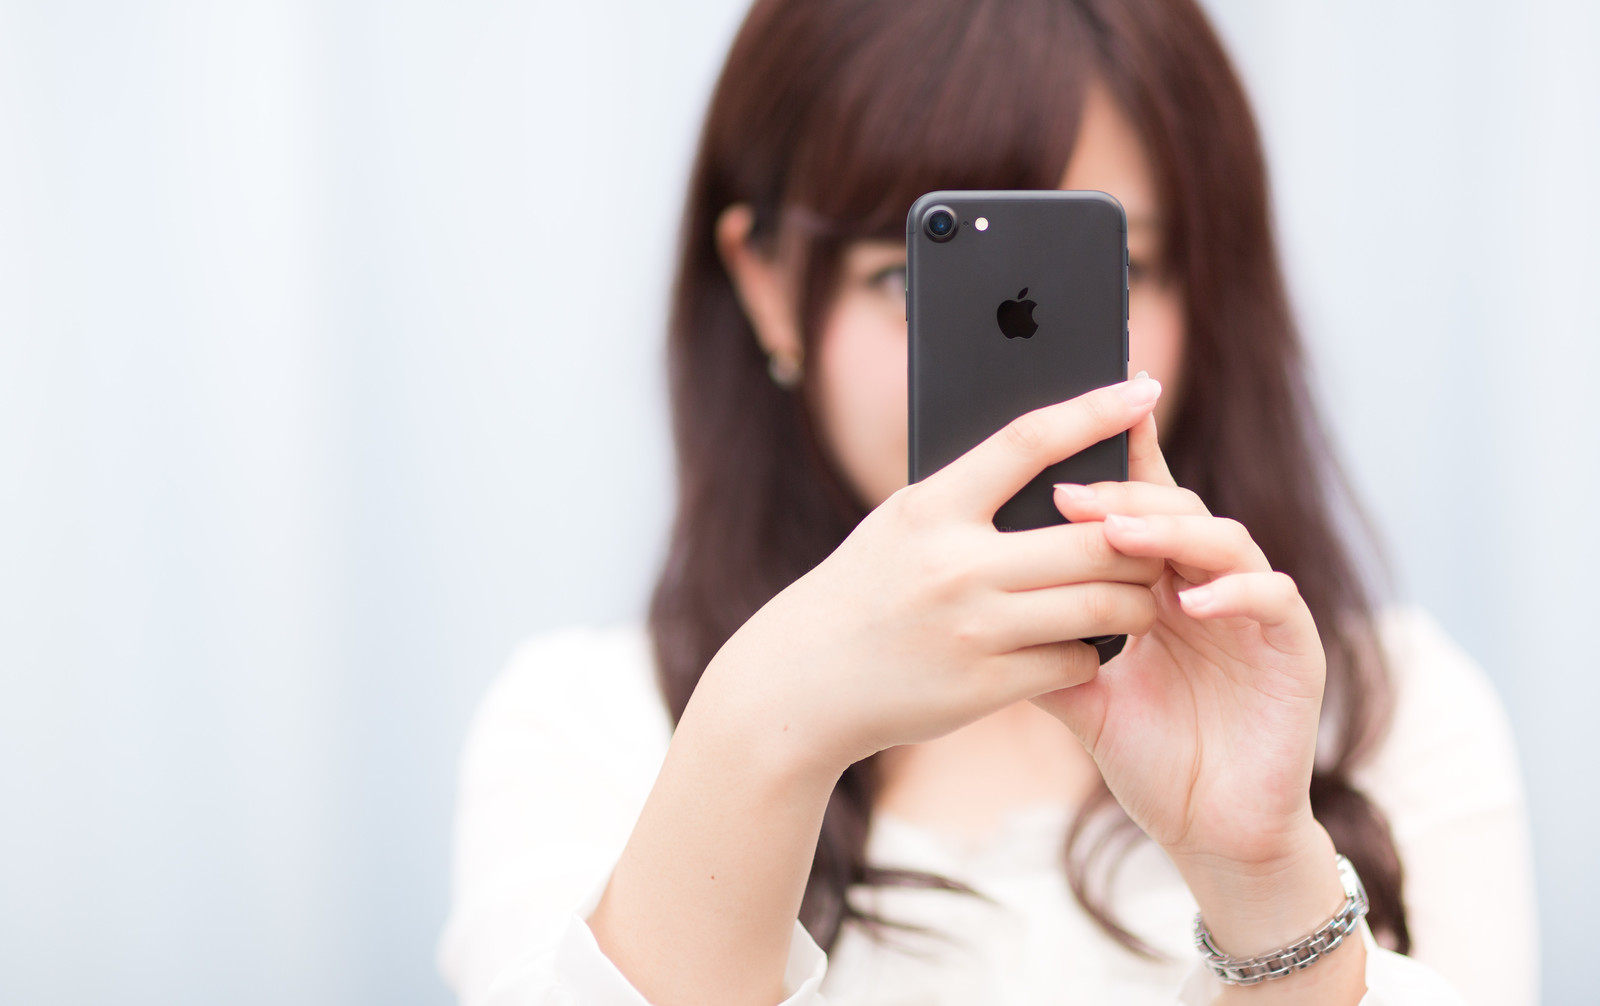 「JK 携帯 フリー」の画像検索結果